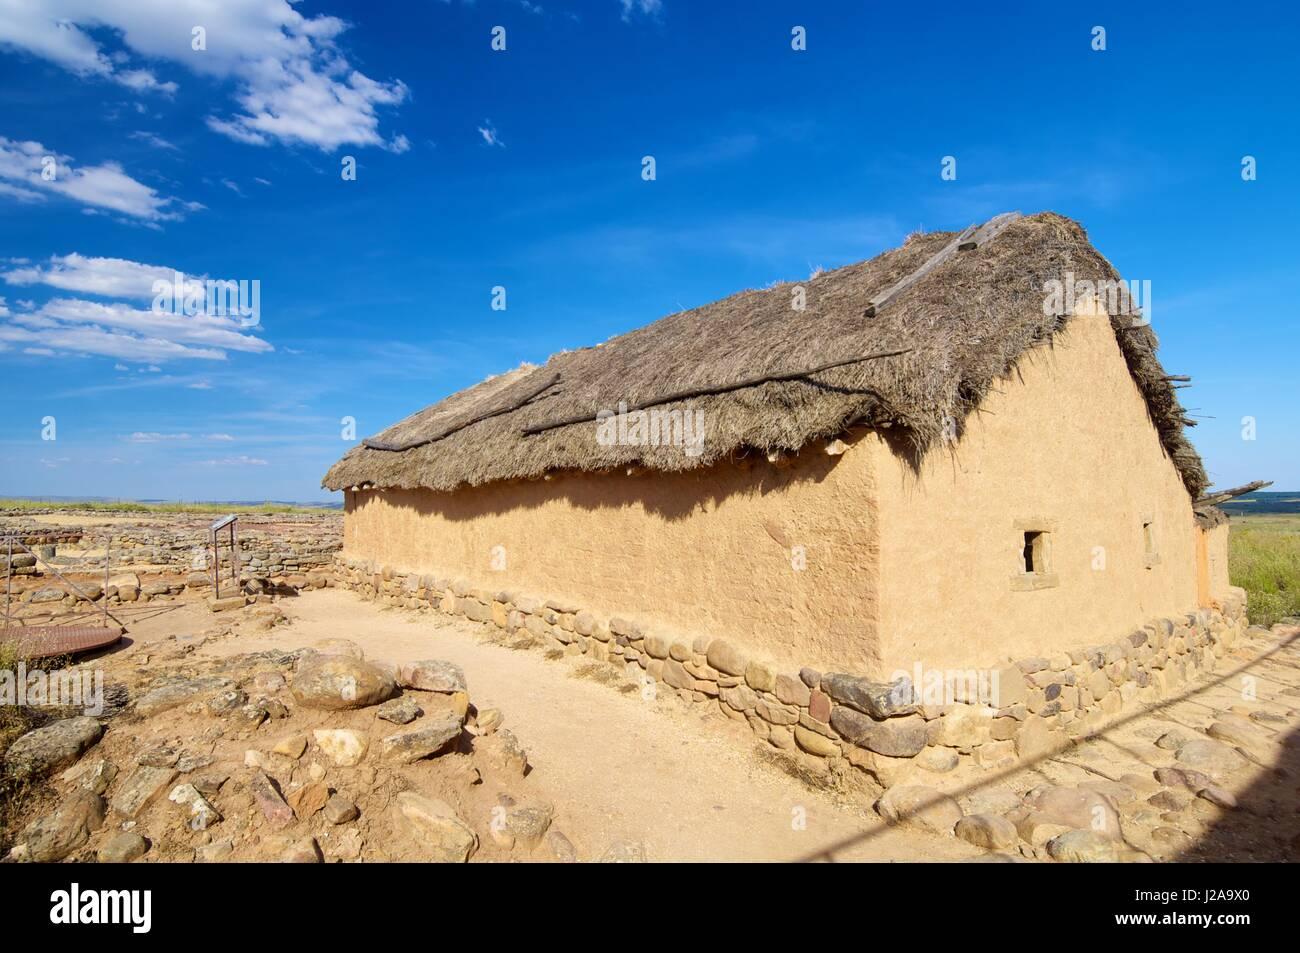 Archaeological remains of the ruins of Numancia, Soria, Castilla Leon, Spain - Stock Image